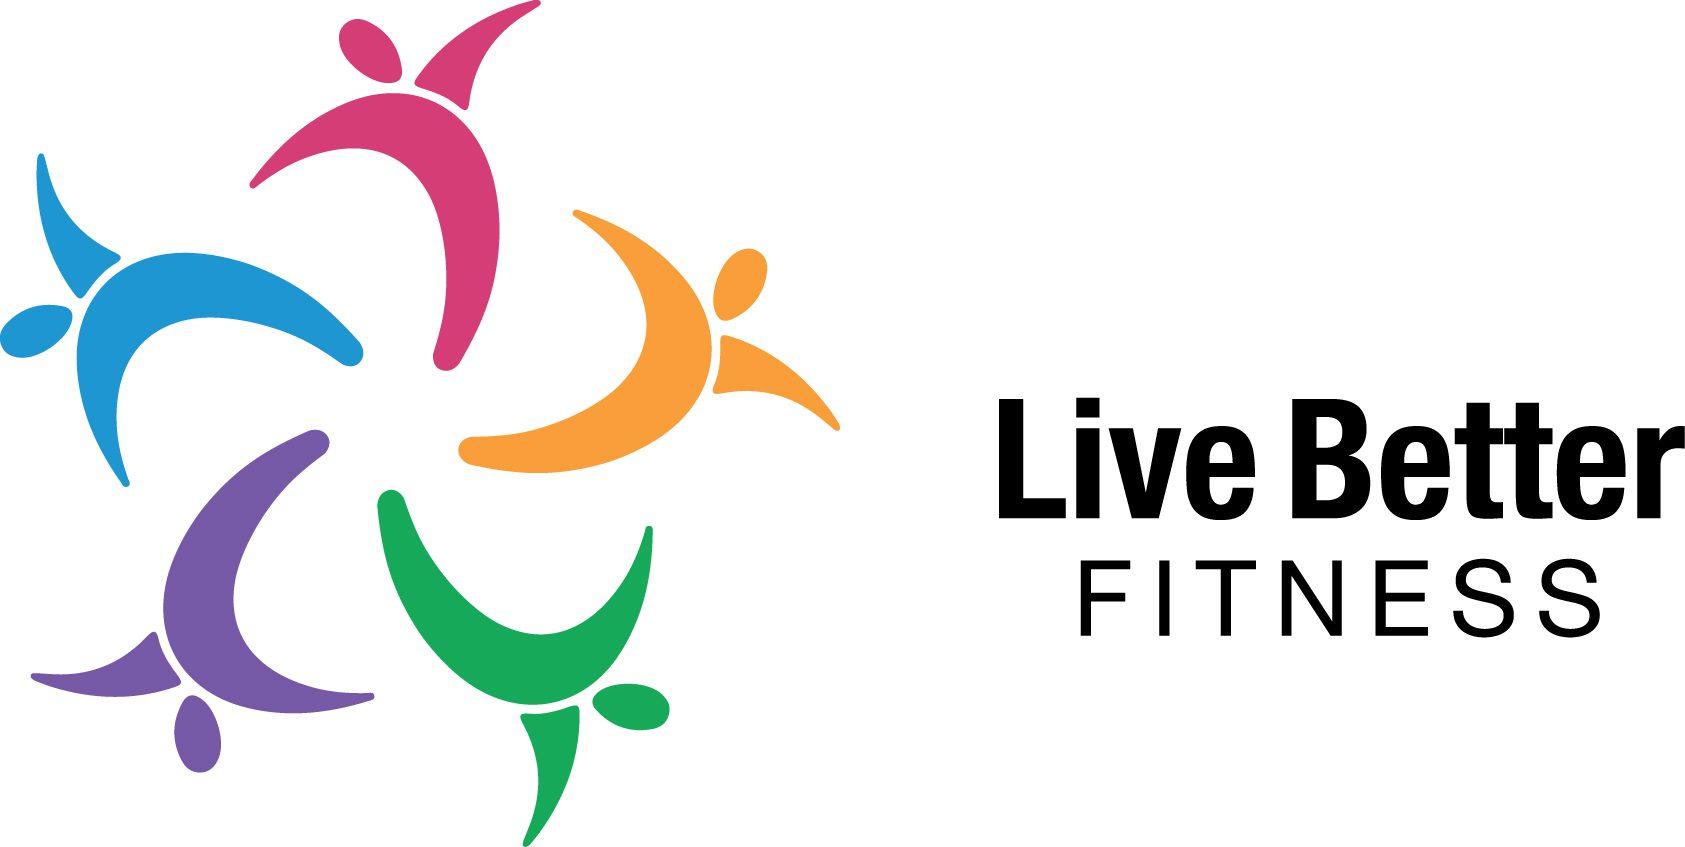 Live Better Fitness